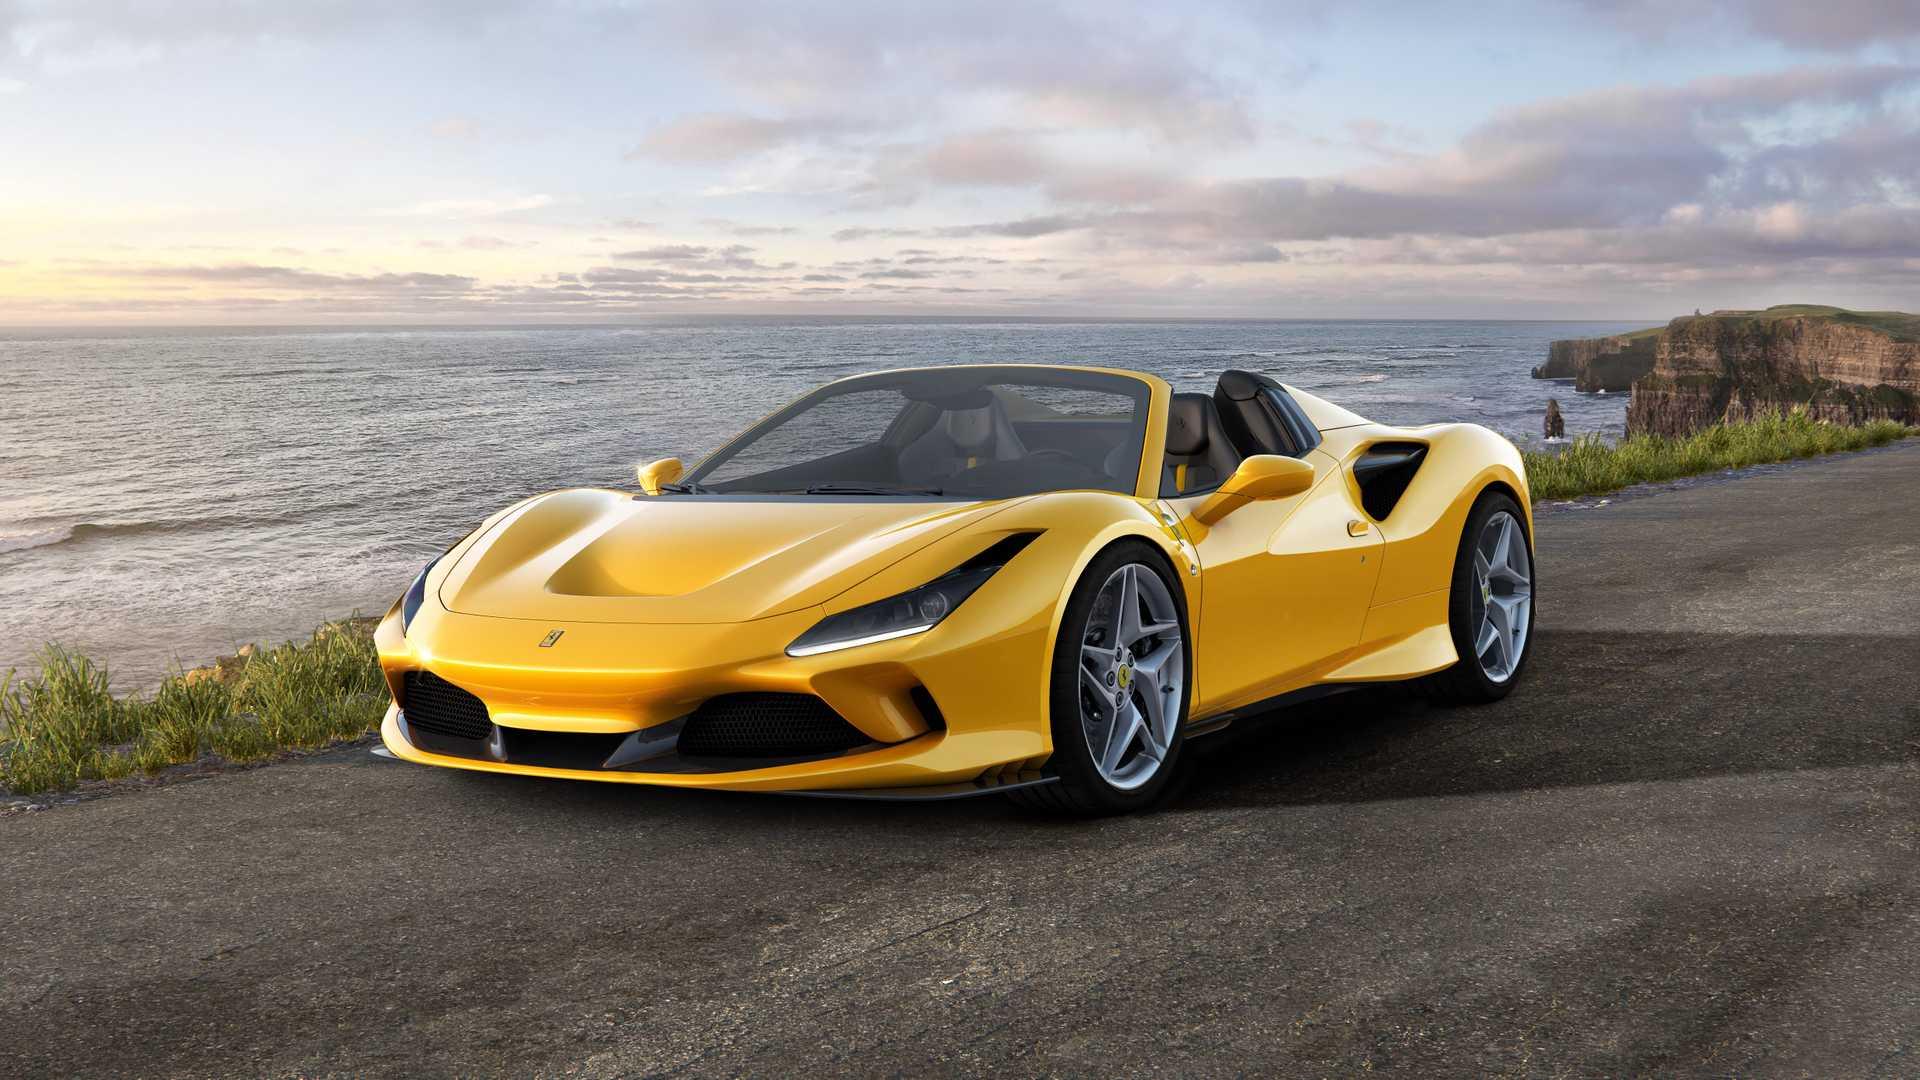 Hy hữu: 24 siêu xe Ferrari tại Việt Nam bị triệu hồi vì lỗi túi khí Takata